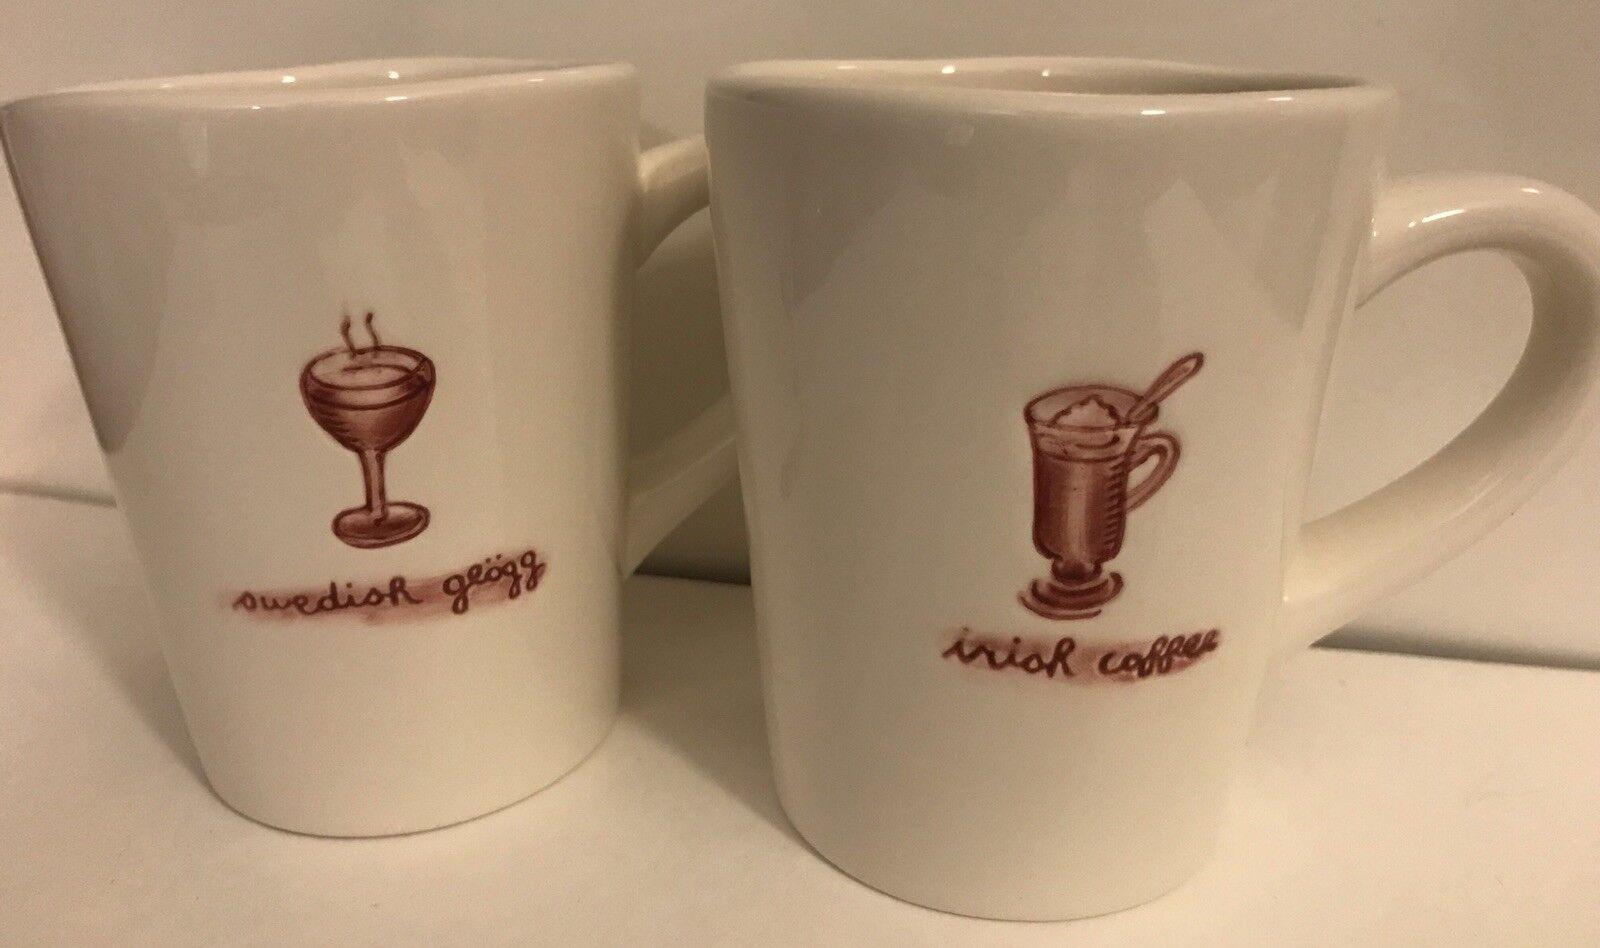 Williams Sonoma Set Of 6 Ceramic Hot Drinks Mugs Mugs Mugs Coffee Cider Toddy Eggnog f4646a